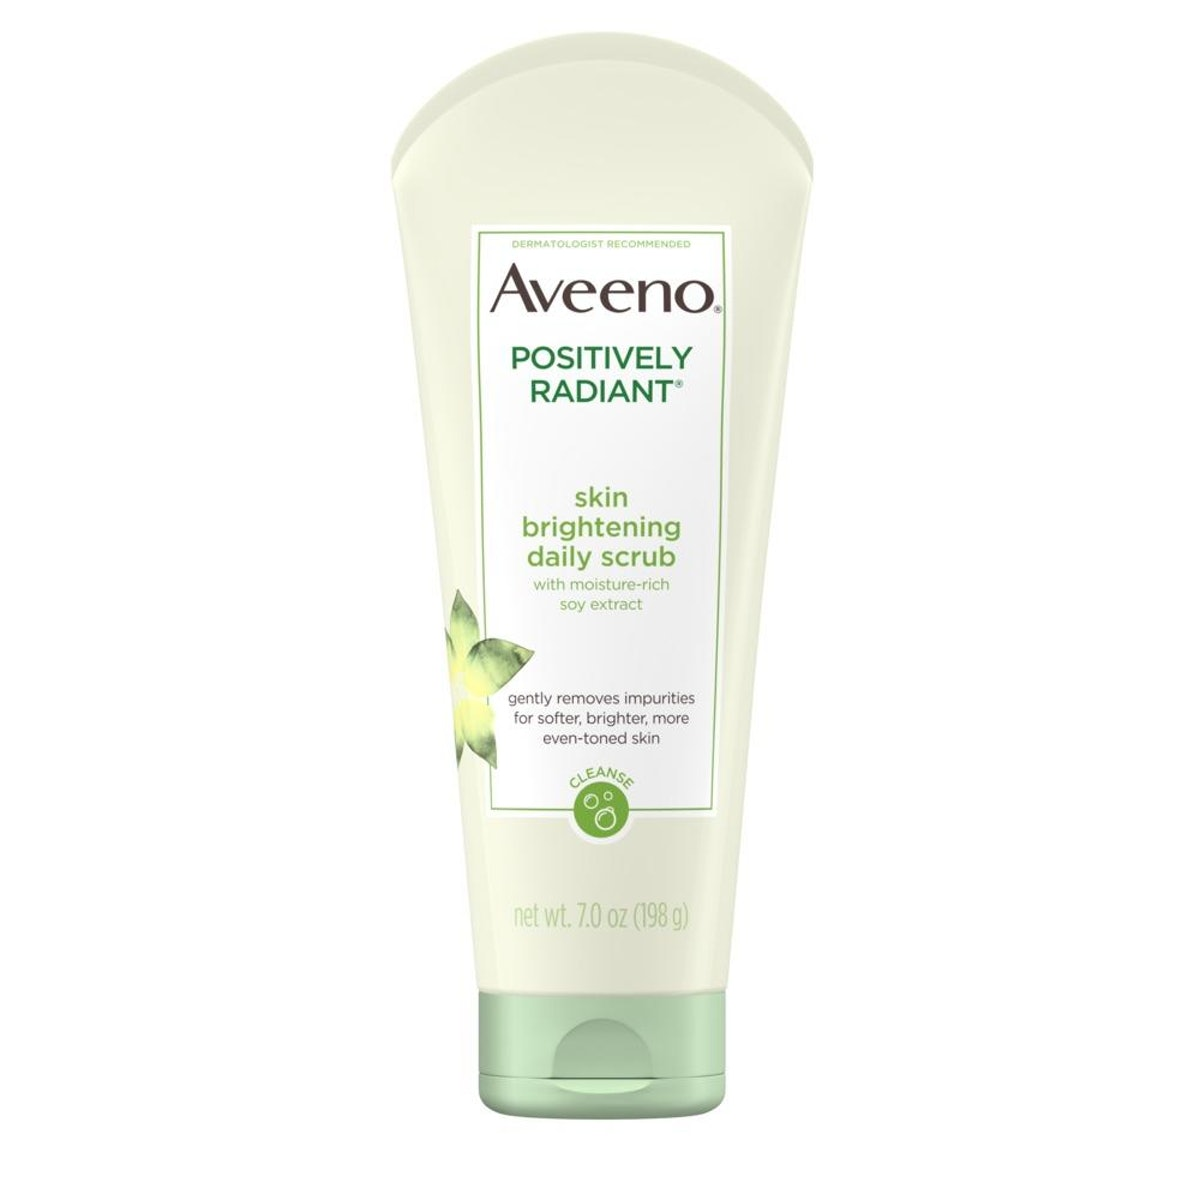 Aveeno Positively RadiantSkin Brightening Daily Face Scrub